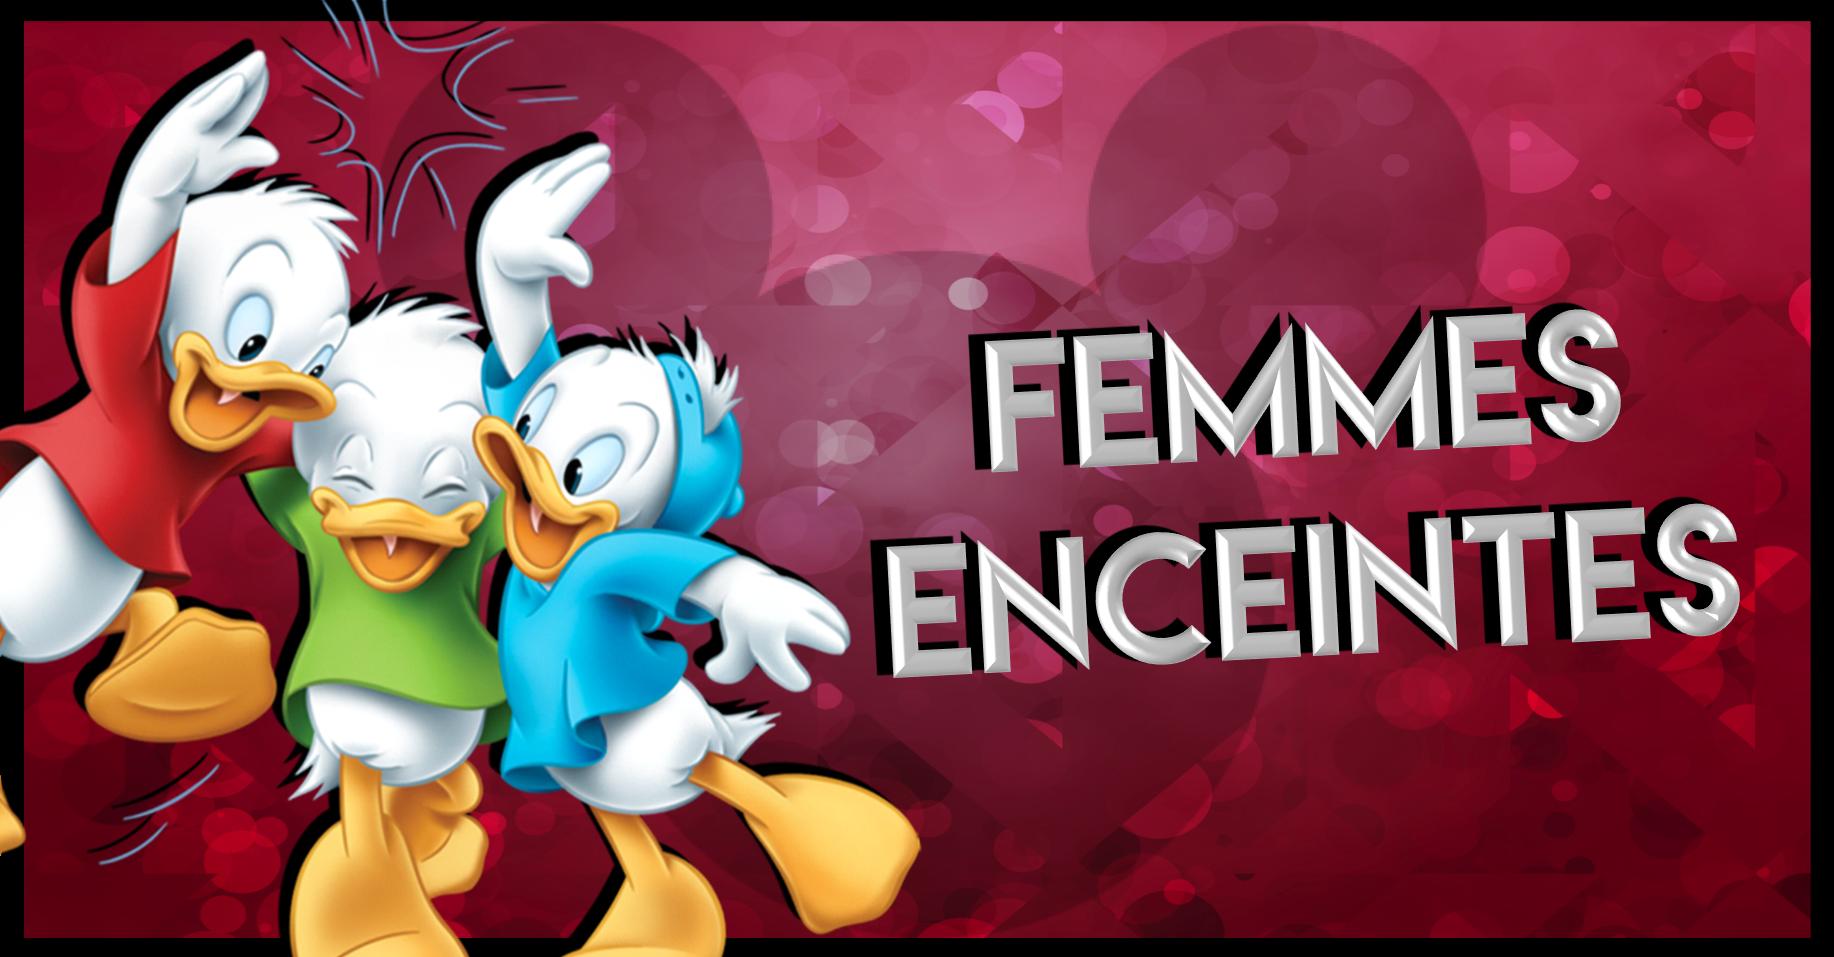 FEMMESENCEINTES.png